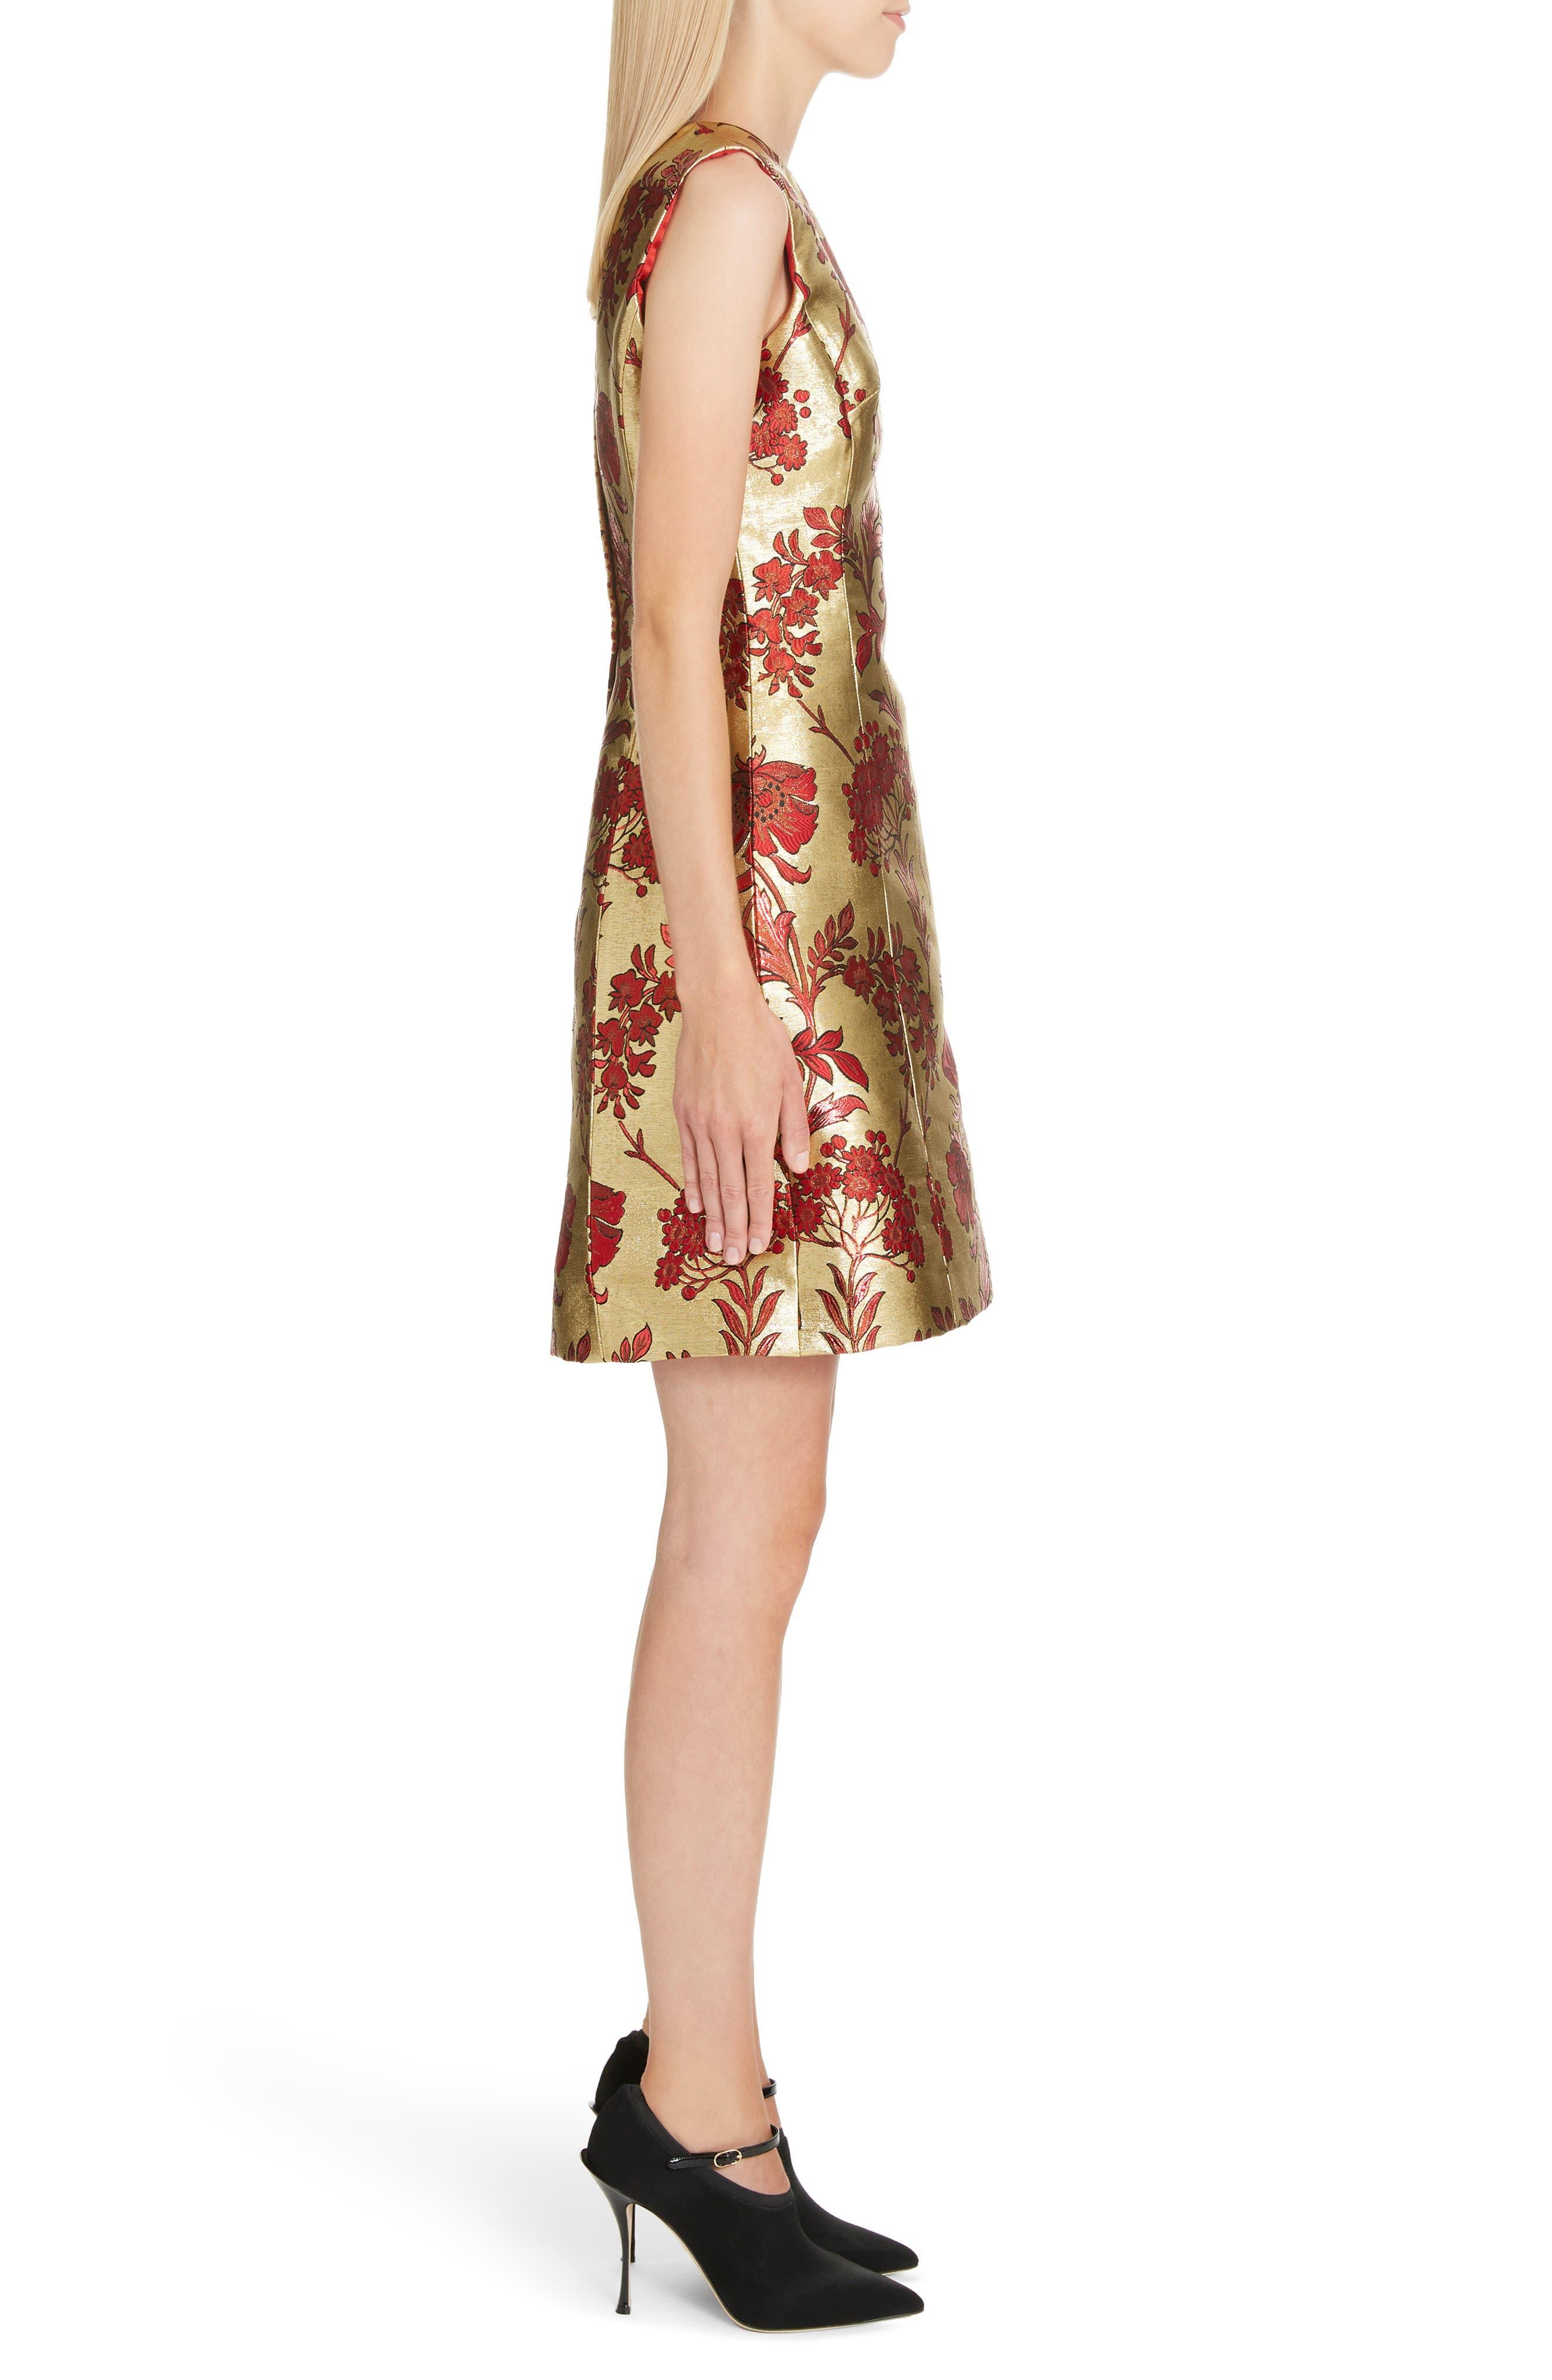 Metallic Jacquard A-Line Dress,                             Alternate thumbnail 3, color,                             S8351 JACQUARD LUREX FLORAL